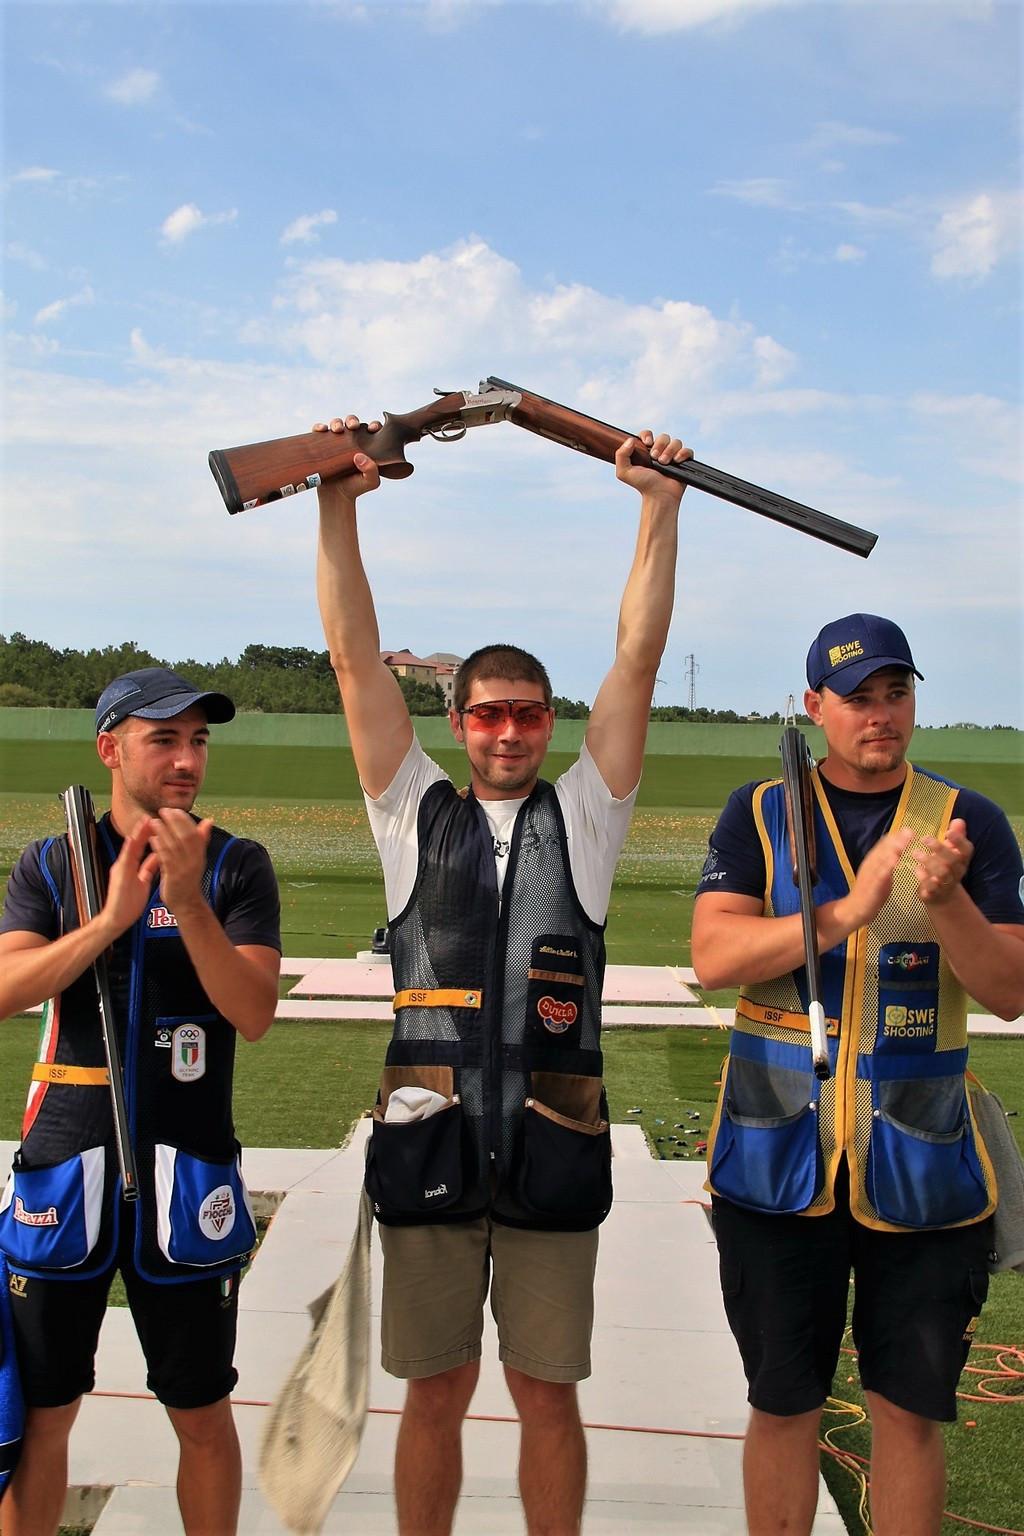 Czech Republic's Milos Slavicek won the men's skeet event ©European Shooting Confederation